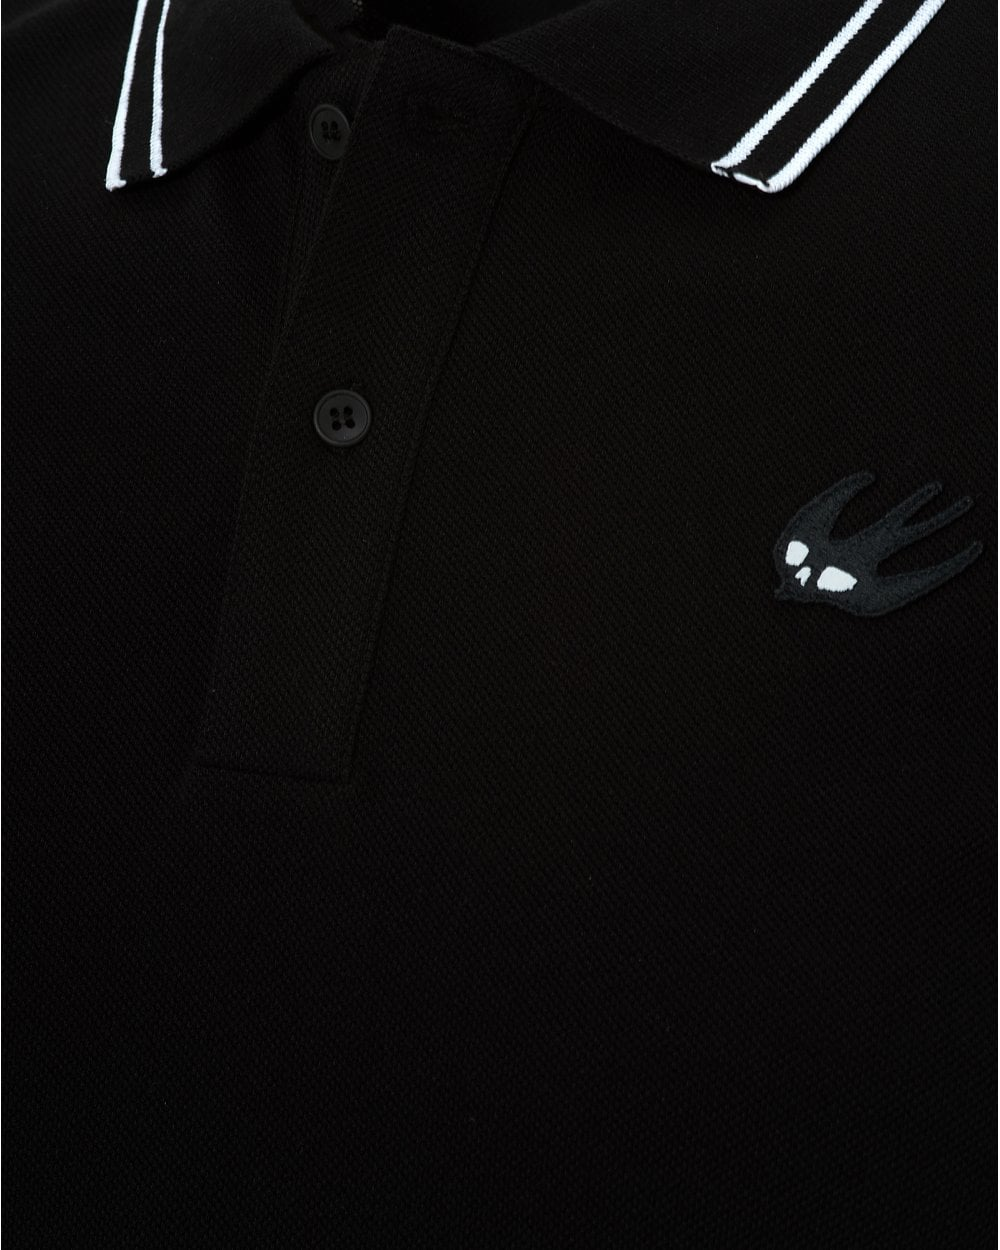 Mcq By Alexander Mcqueen Mens Tipped Polo Shirt Dark Black Polo